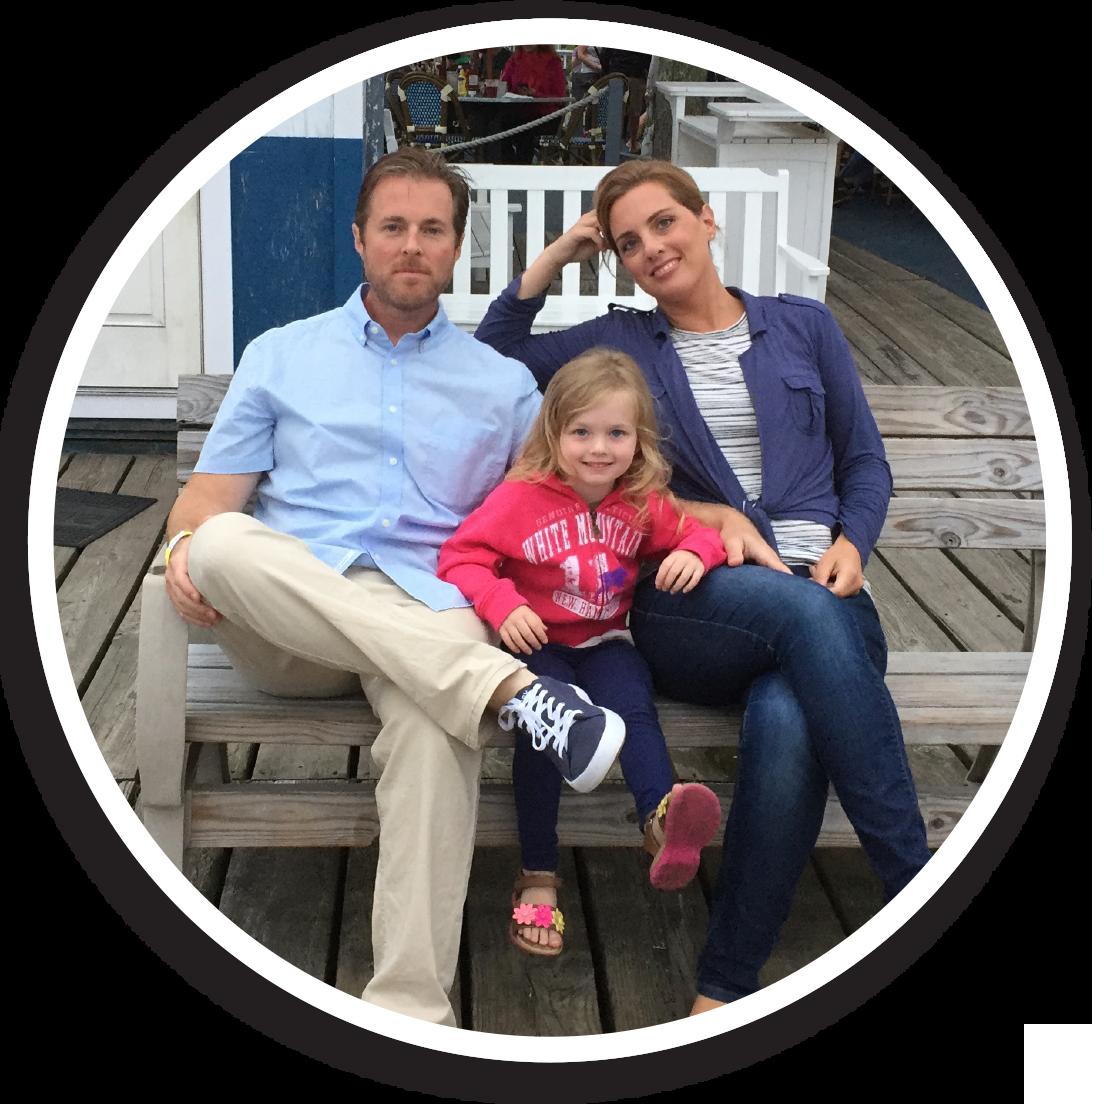 Loving family of three hoping to grow their family through adoption